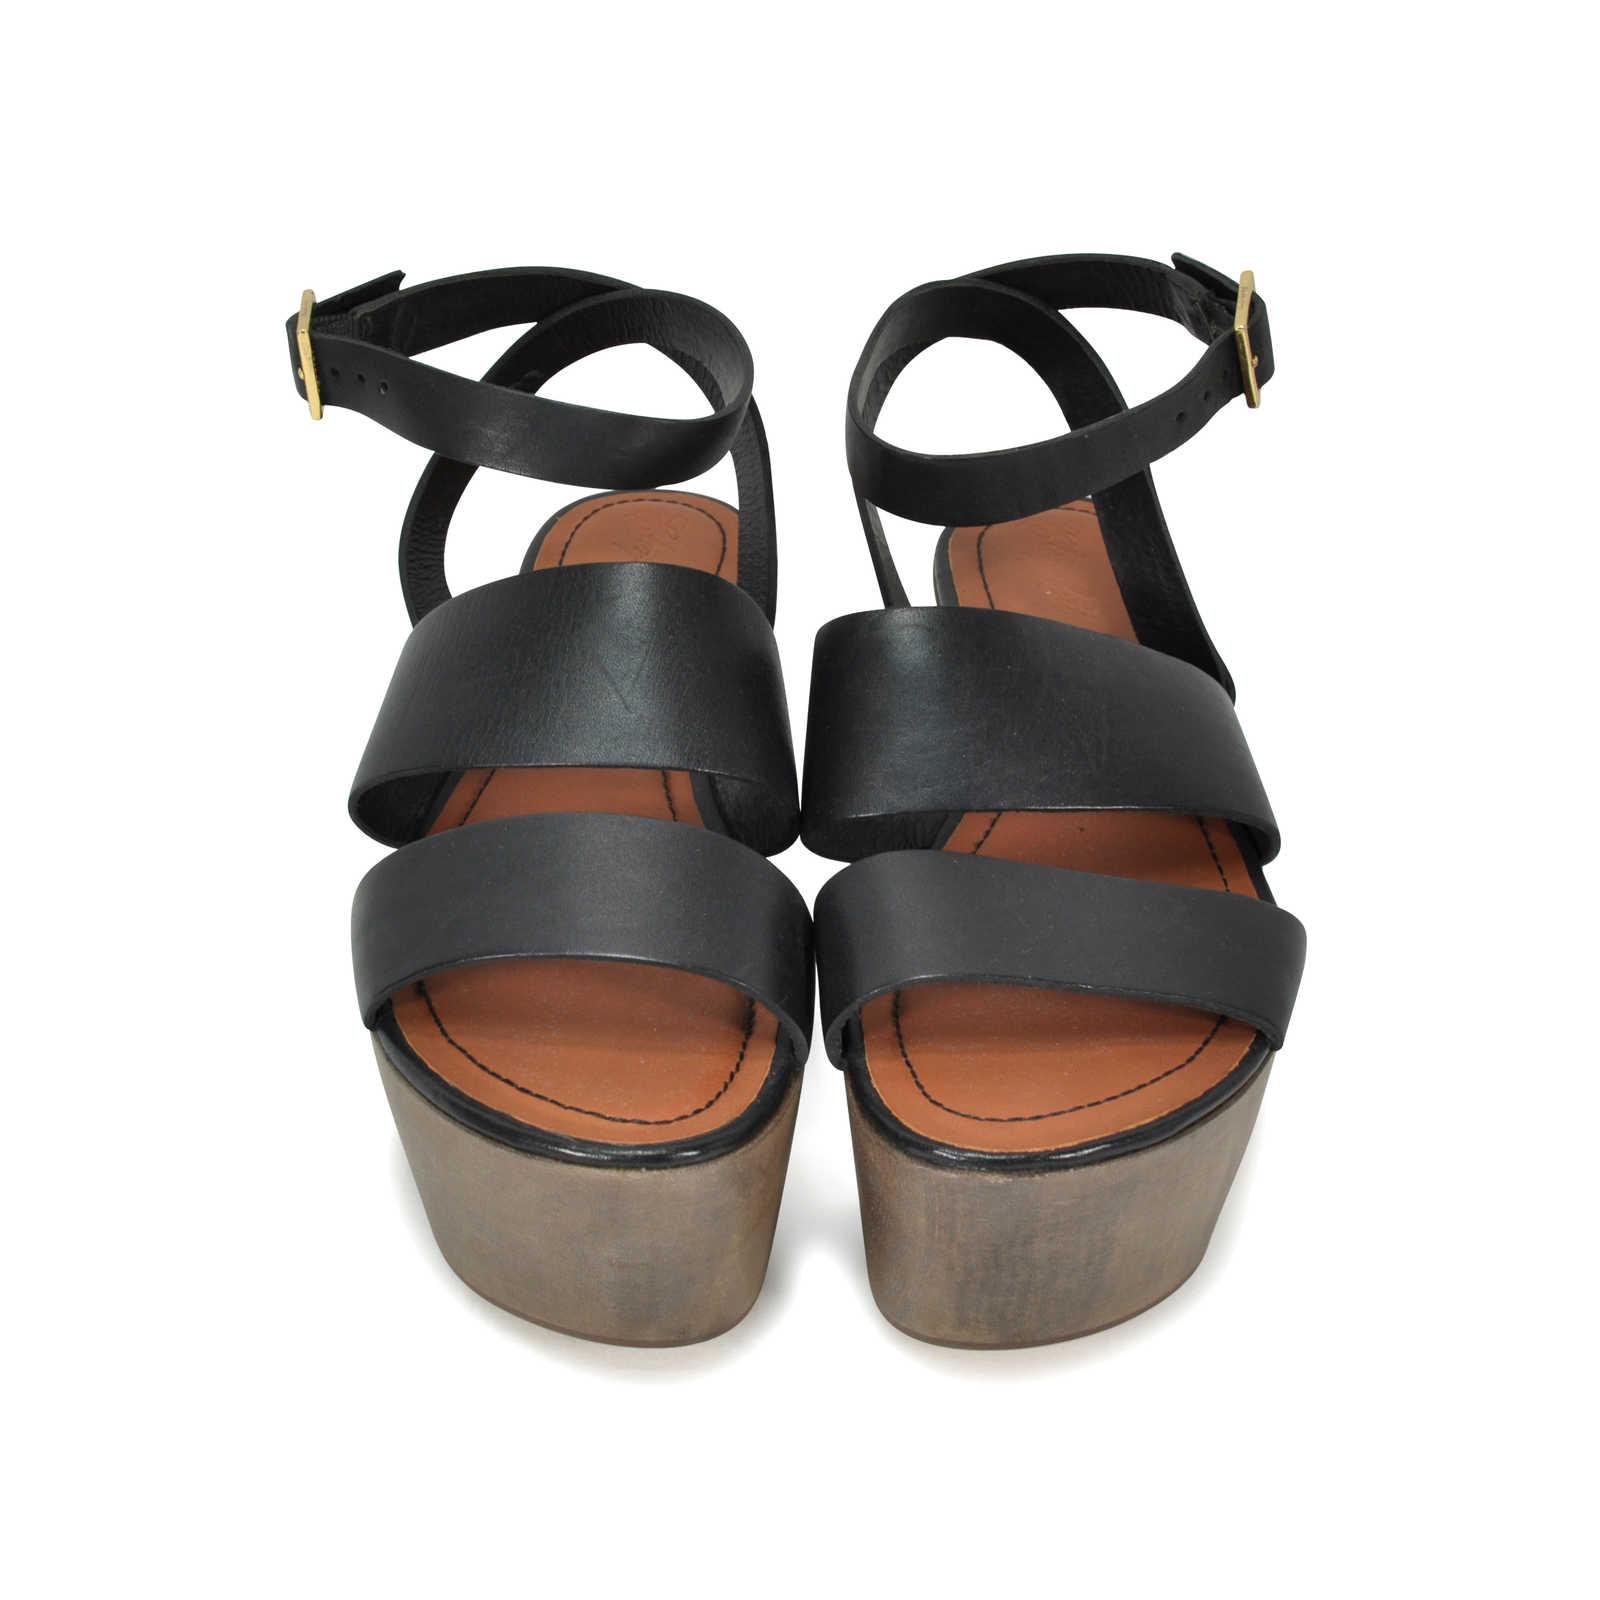 287d499cf Authentic Second Hand Elizabeth and James Bax Flatform Sandals  (PSS-284-00008) ...